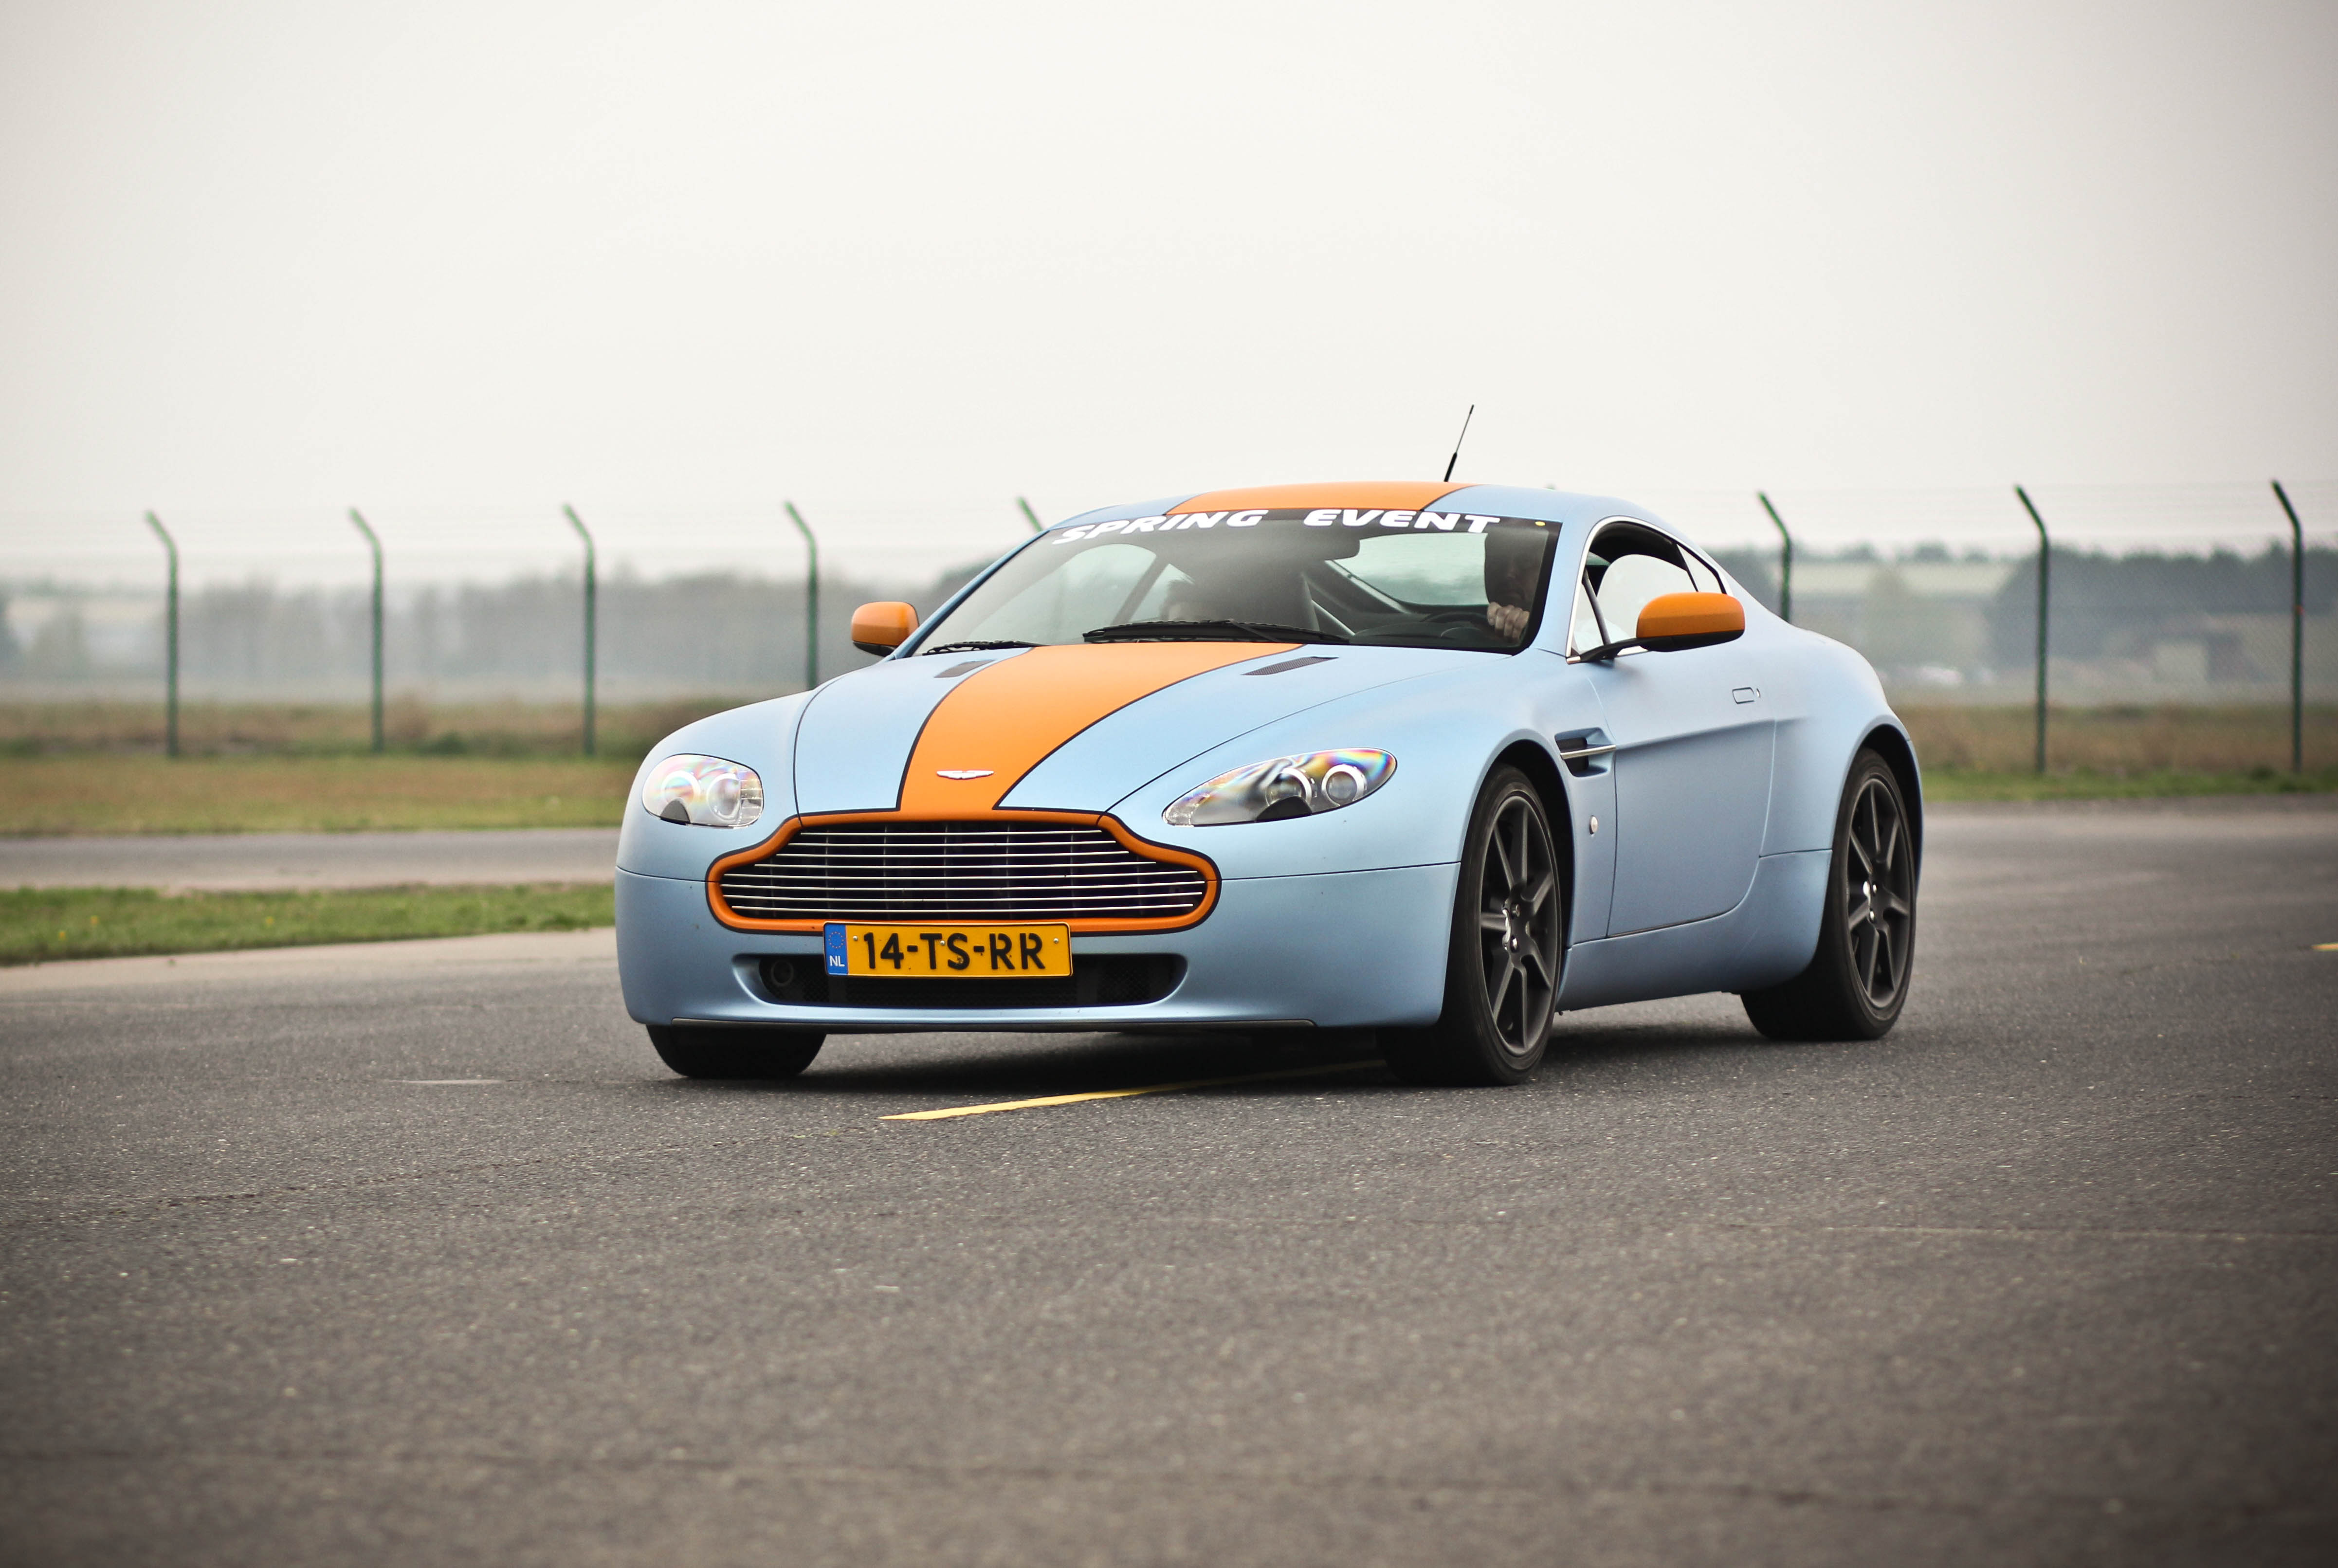 Spring Event 2014 - www.hartvoorautos.nl